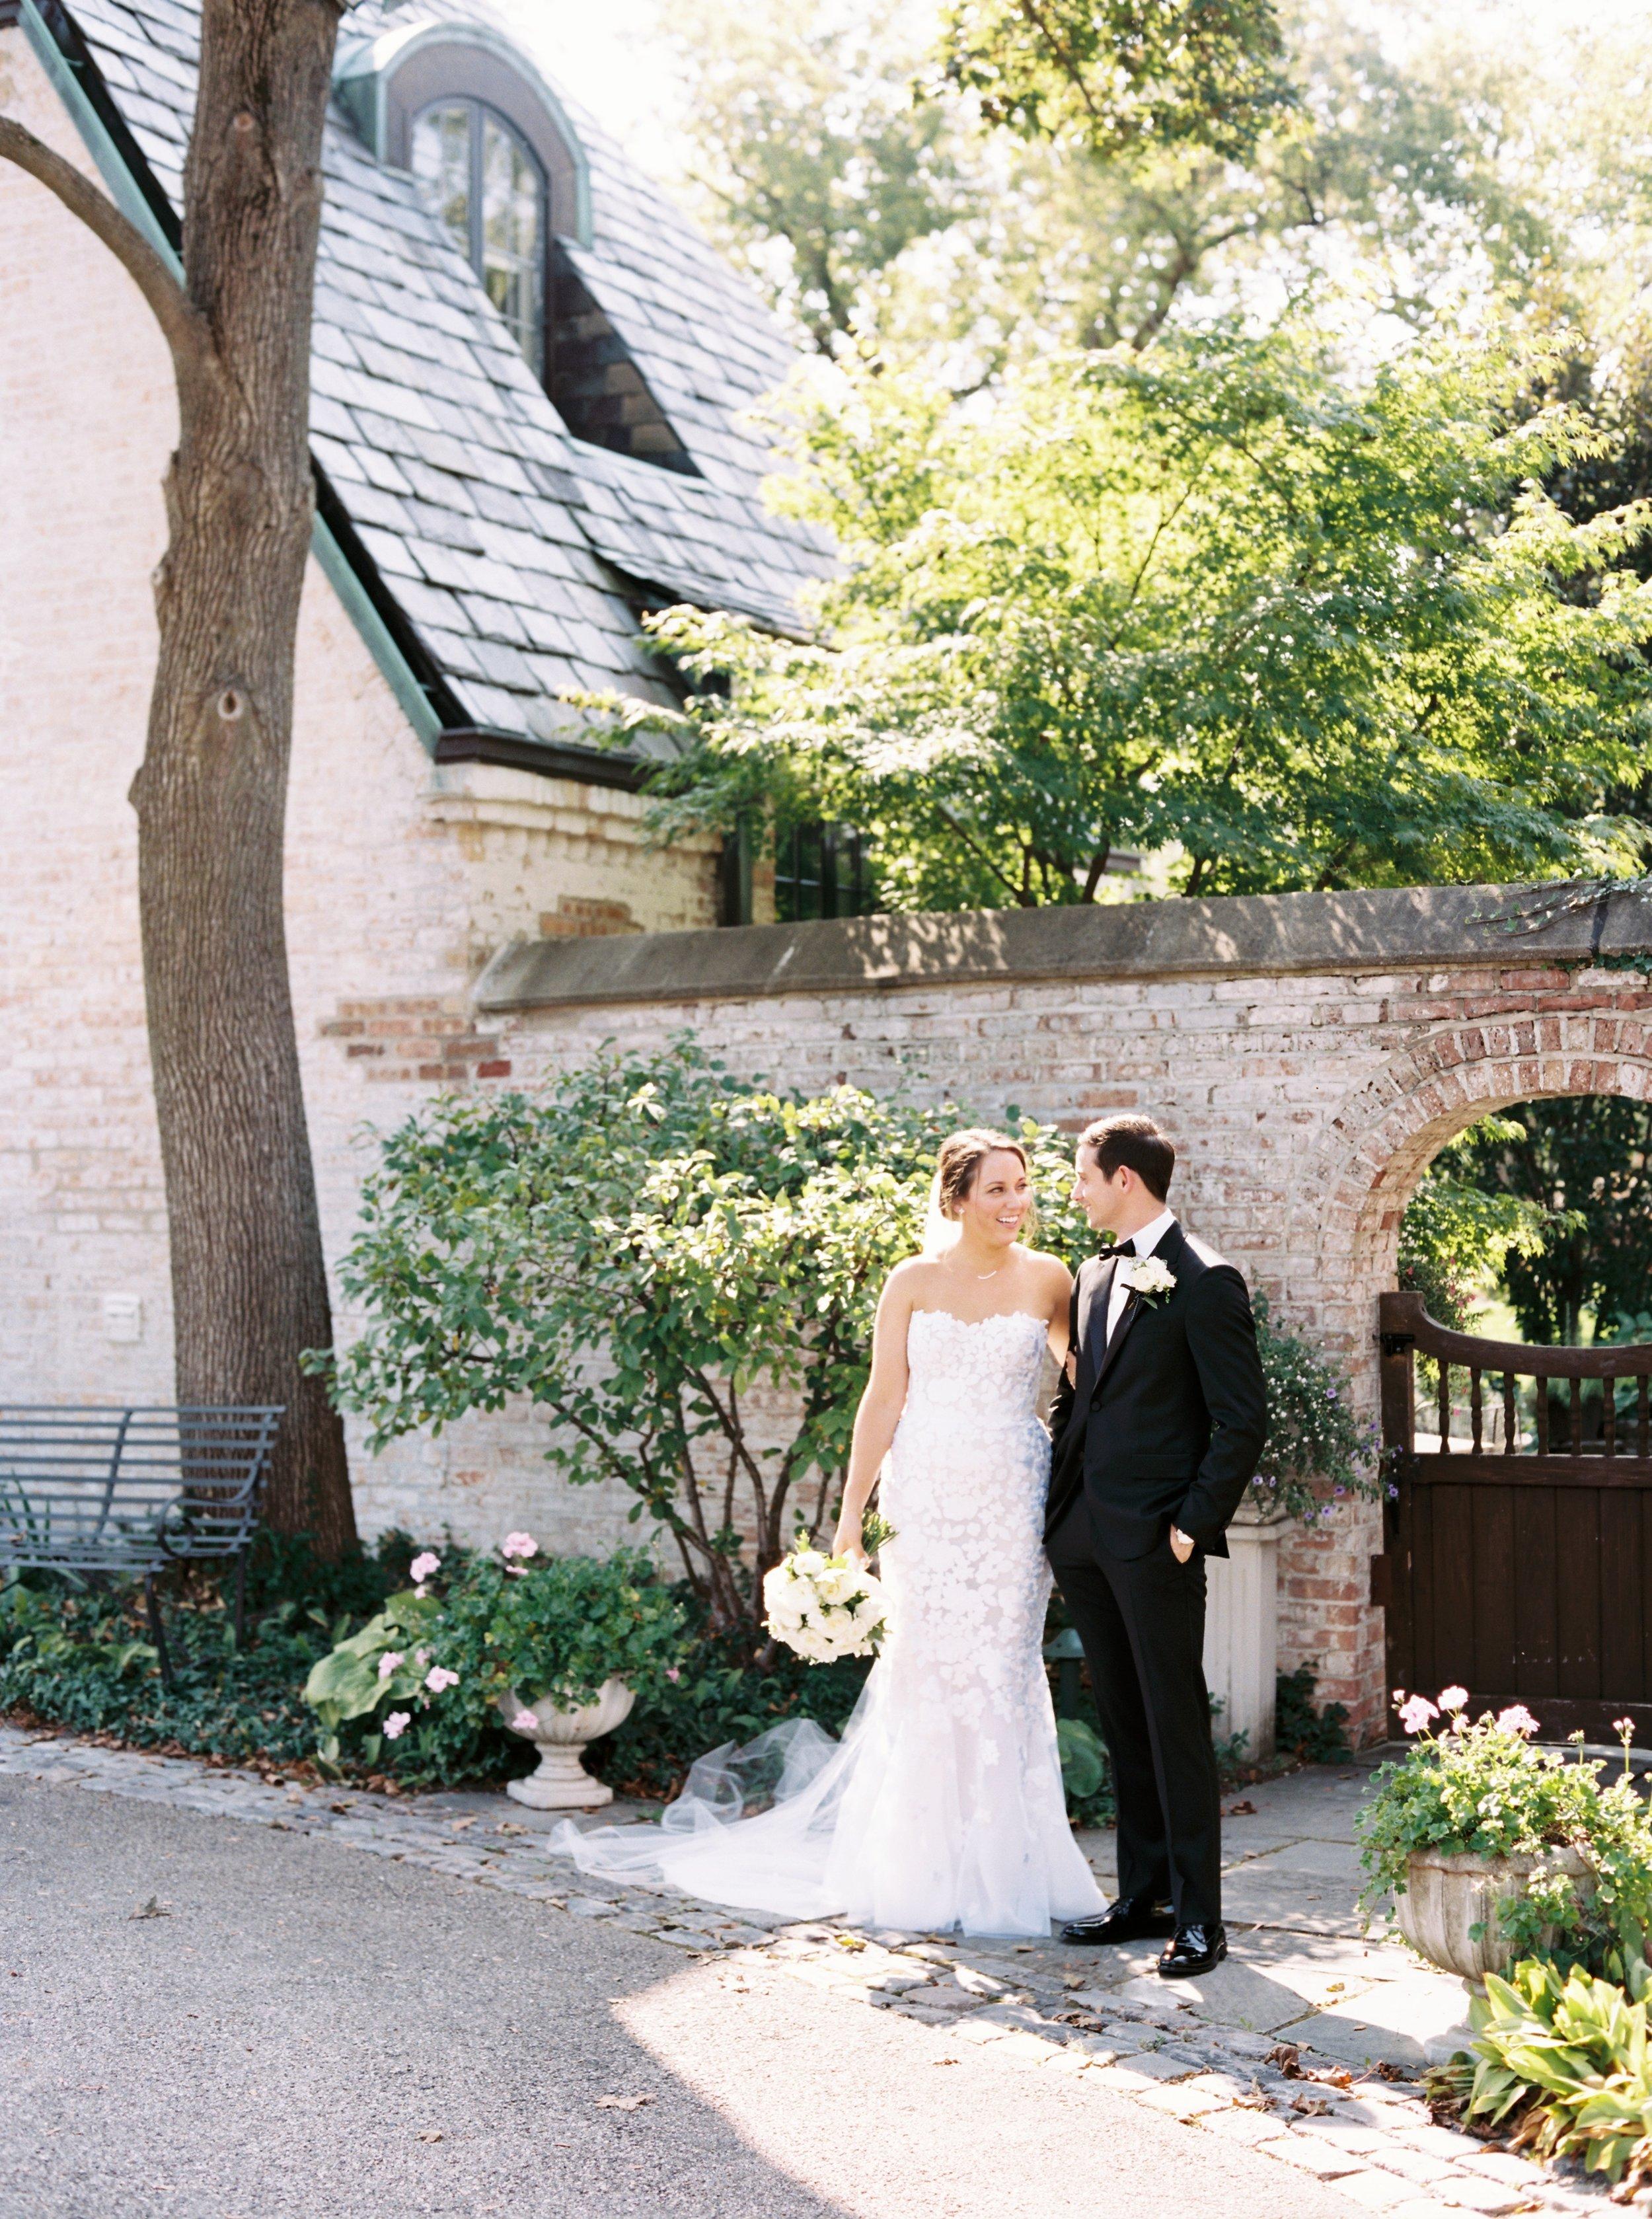 Kyle John l Fine Art Wedding Photography l Chicago, Copenhagen, California, New York, Destination l Blog l Kate and Michael_Winnetka_14